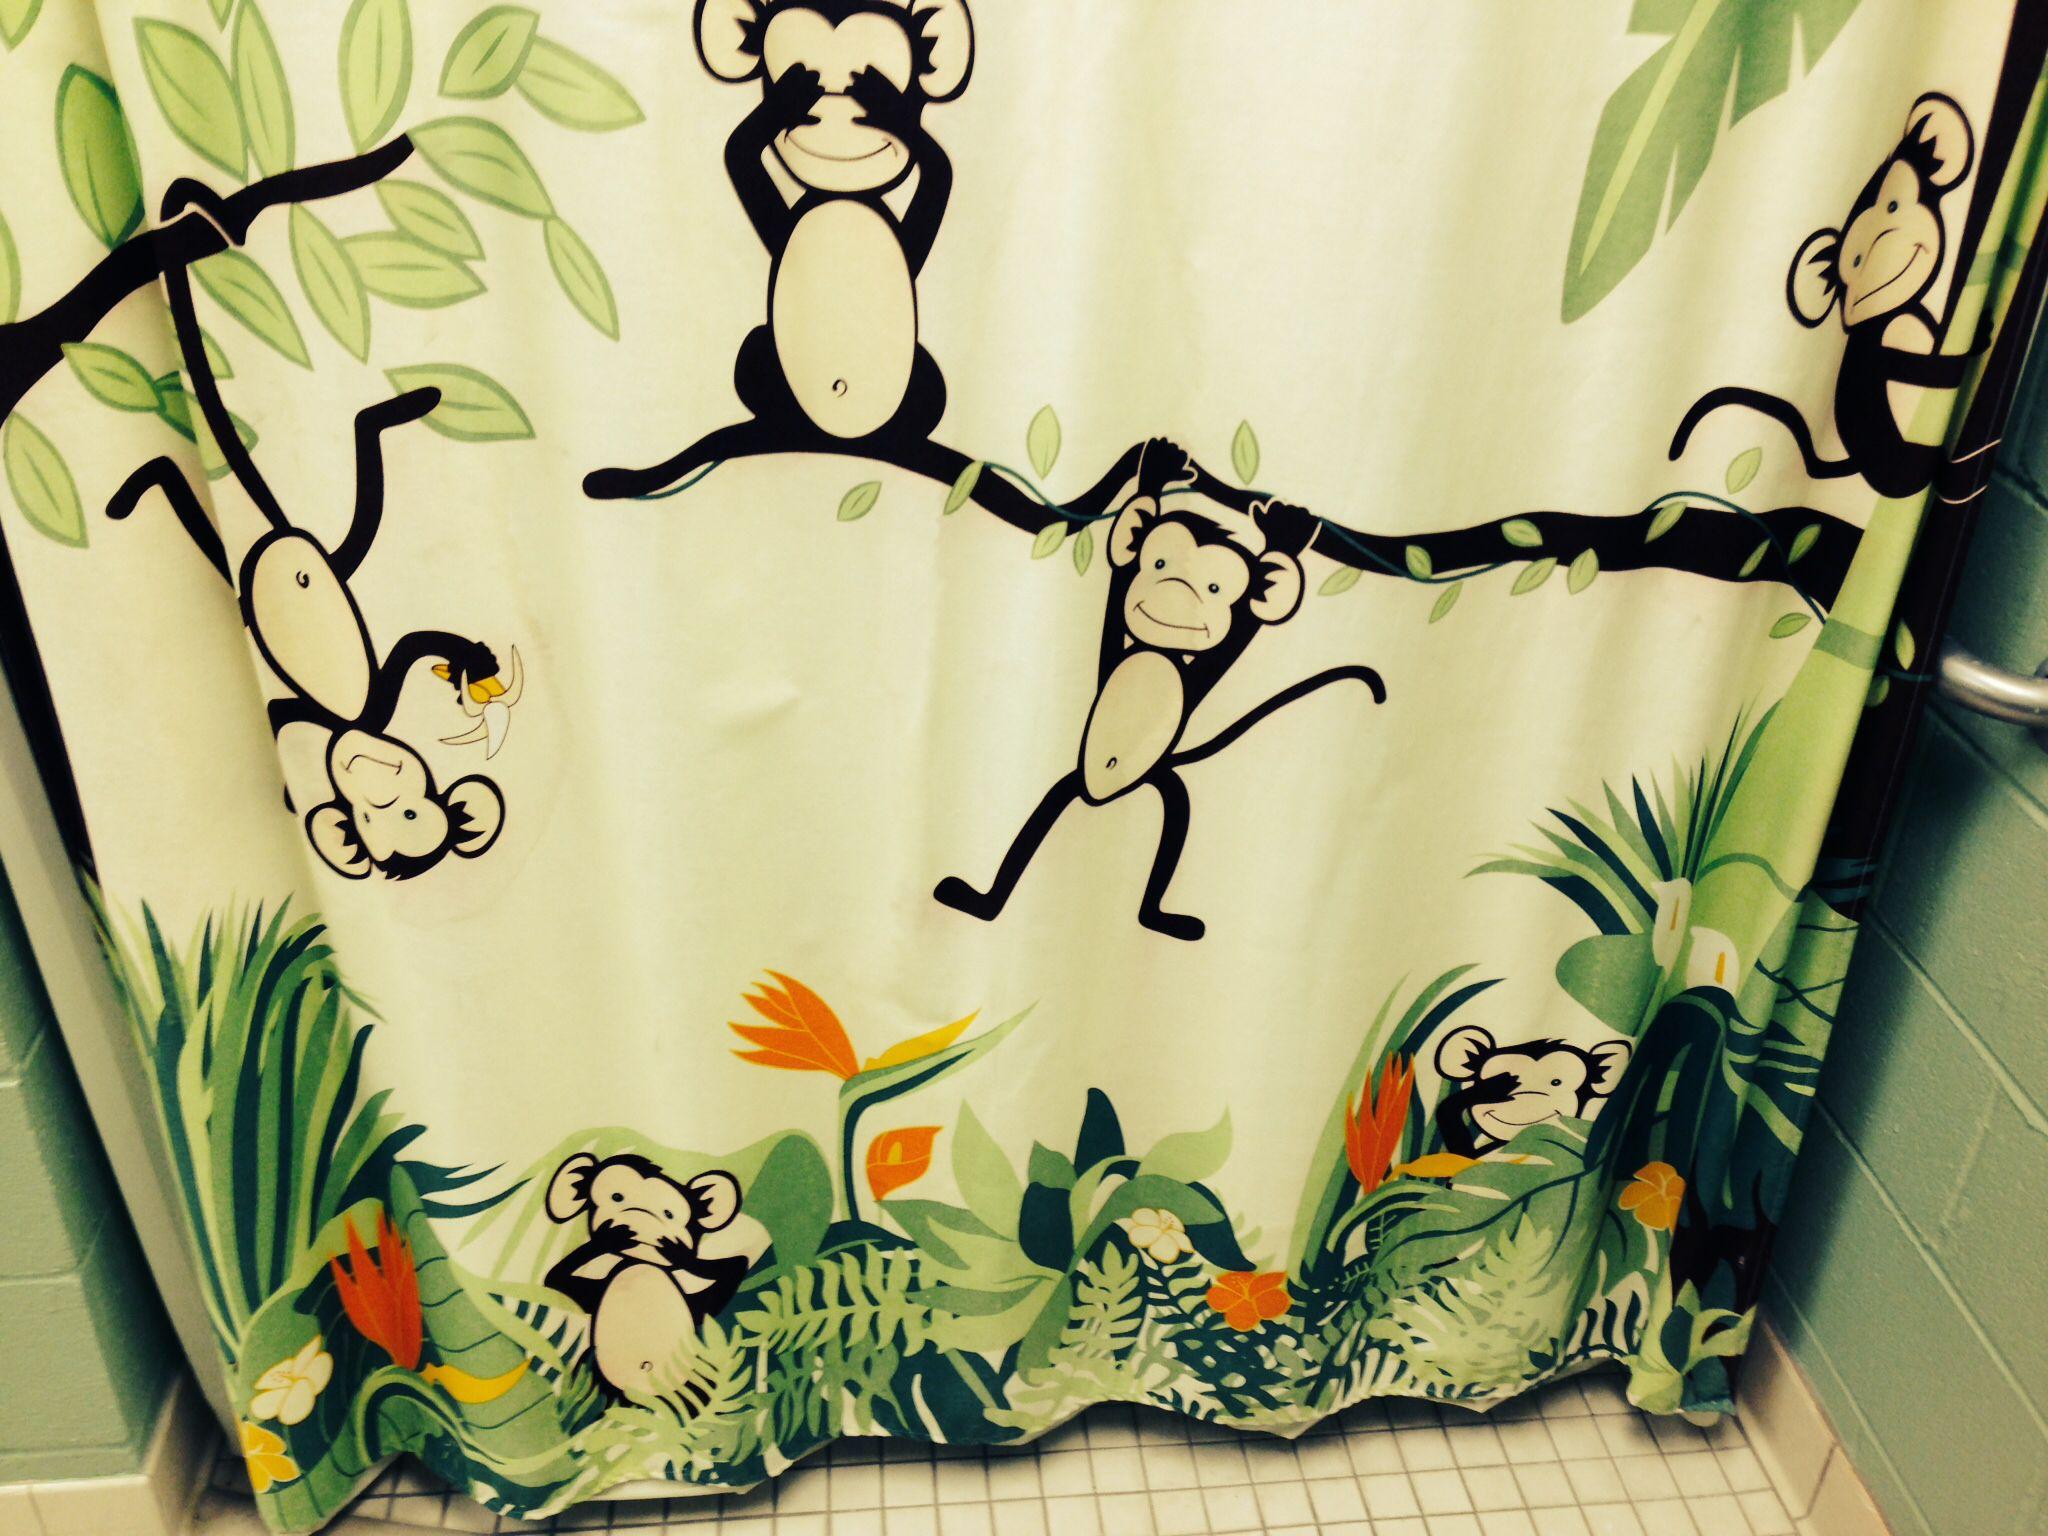 Rainforest shower curtain - Rainforest Shower Curtain